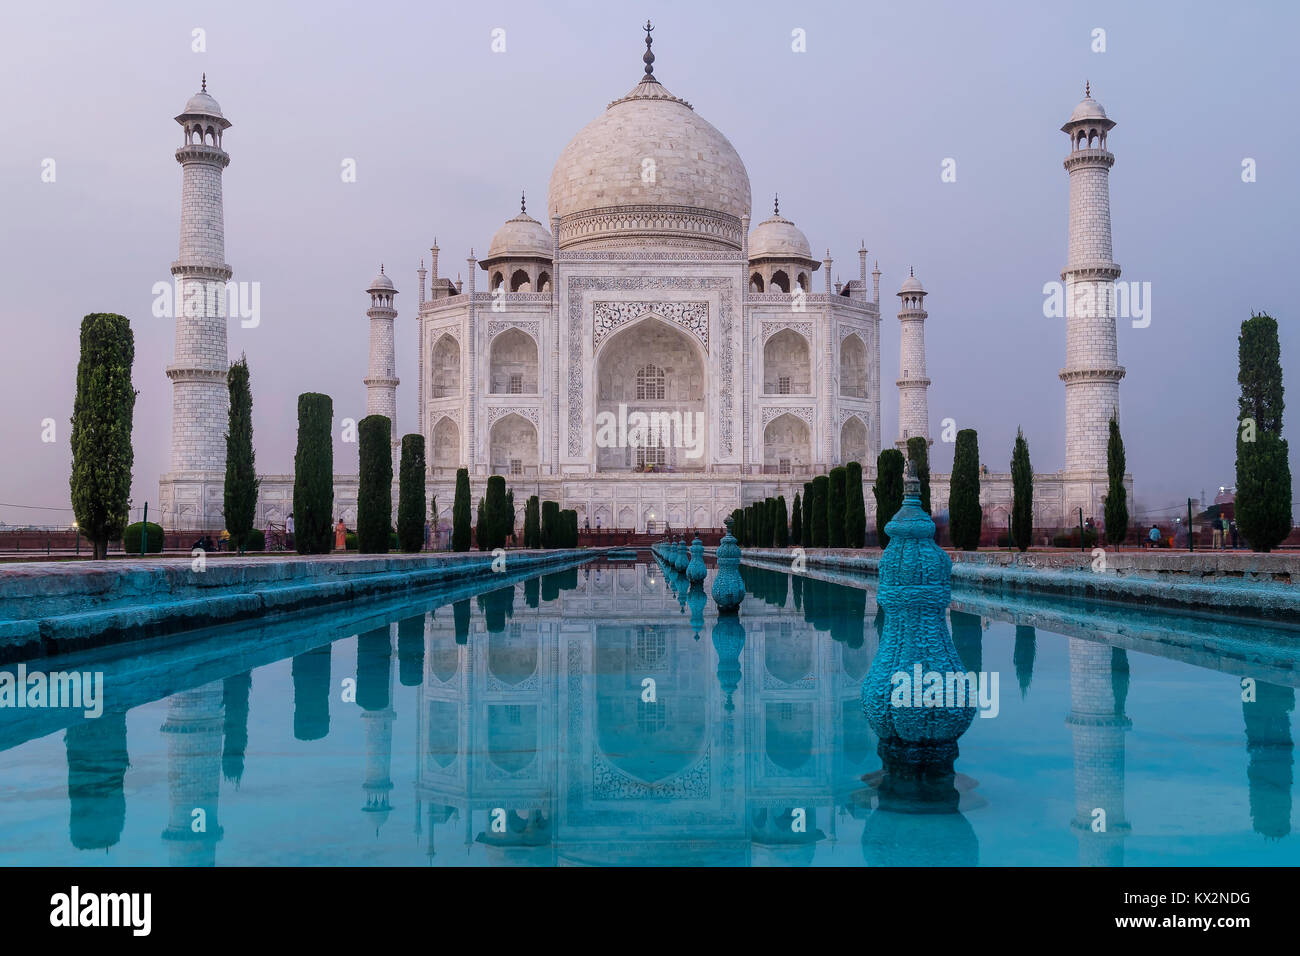 Taj Mahal in the evening light, Agra, Uttar Pradesh, India - Stock Image